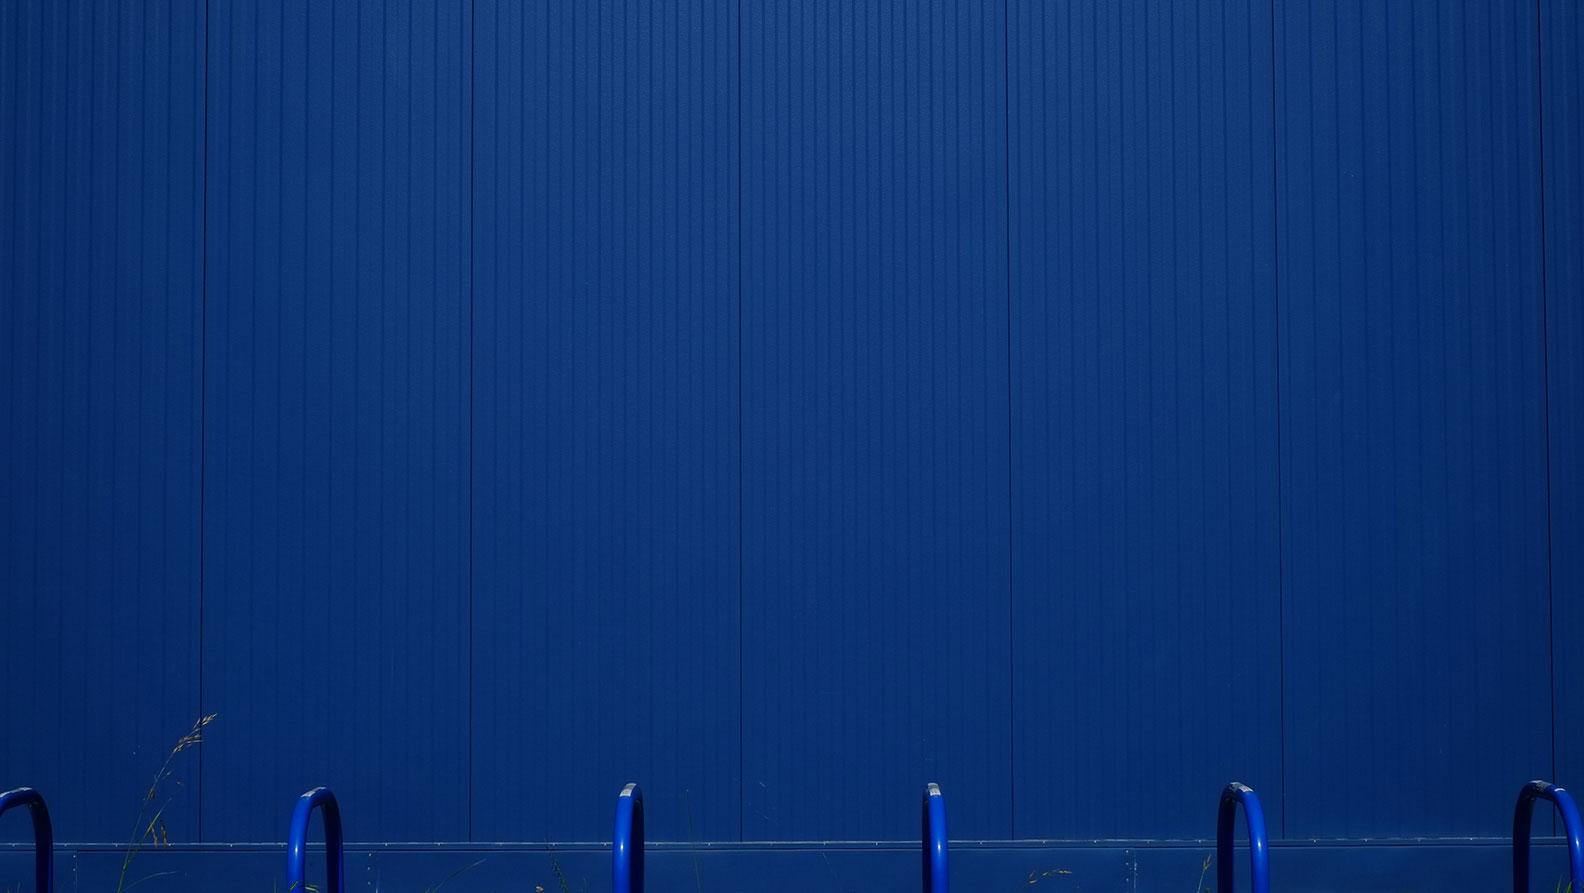 bluewarriorswall